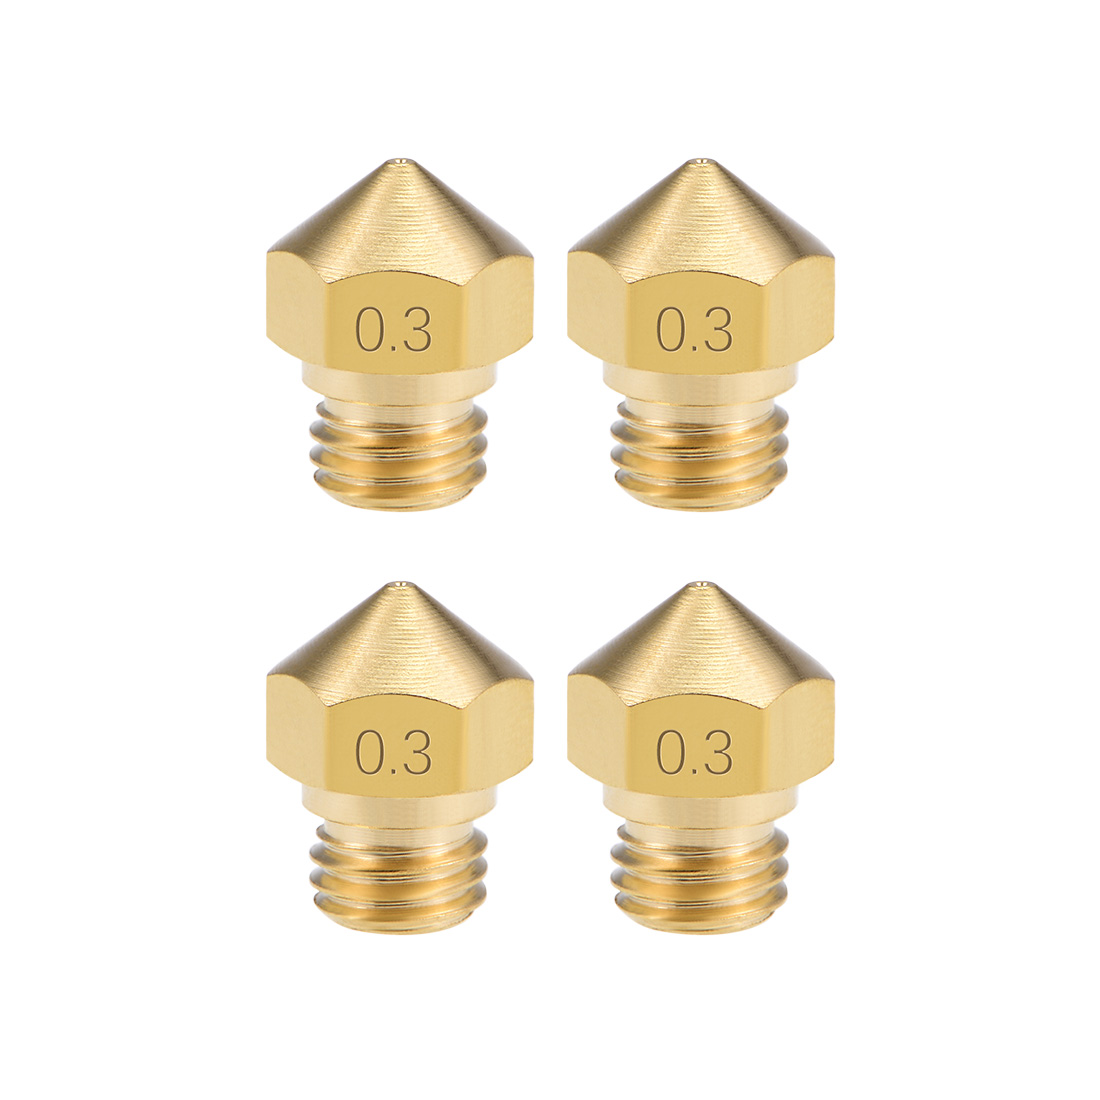 0.3mm 3D Printer Nozzle Head M7 Thread MK10 1.75mm Extruder Print, Brass 4pcs